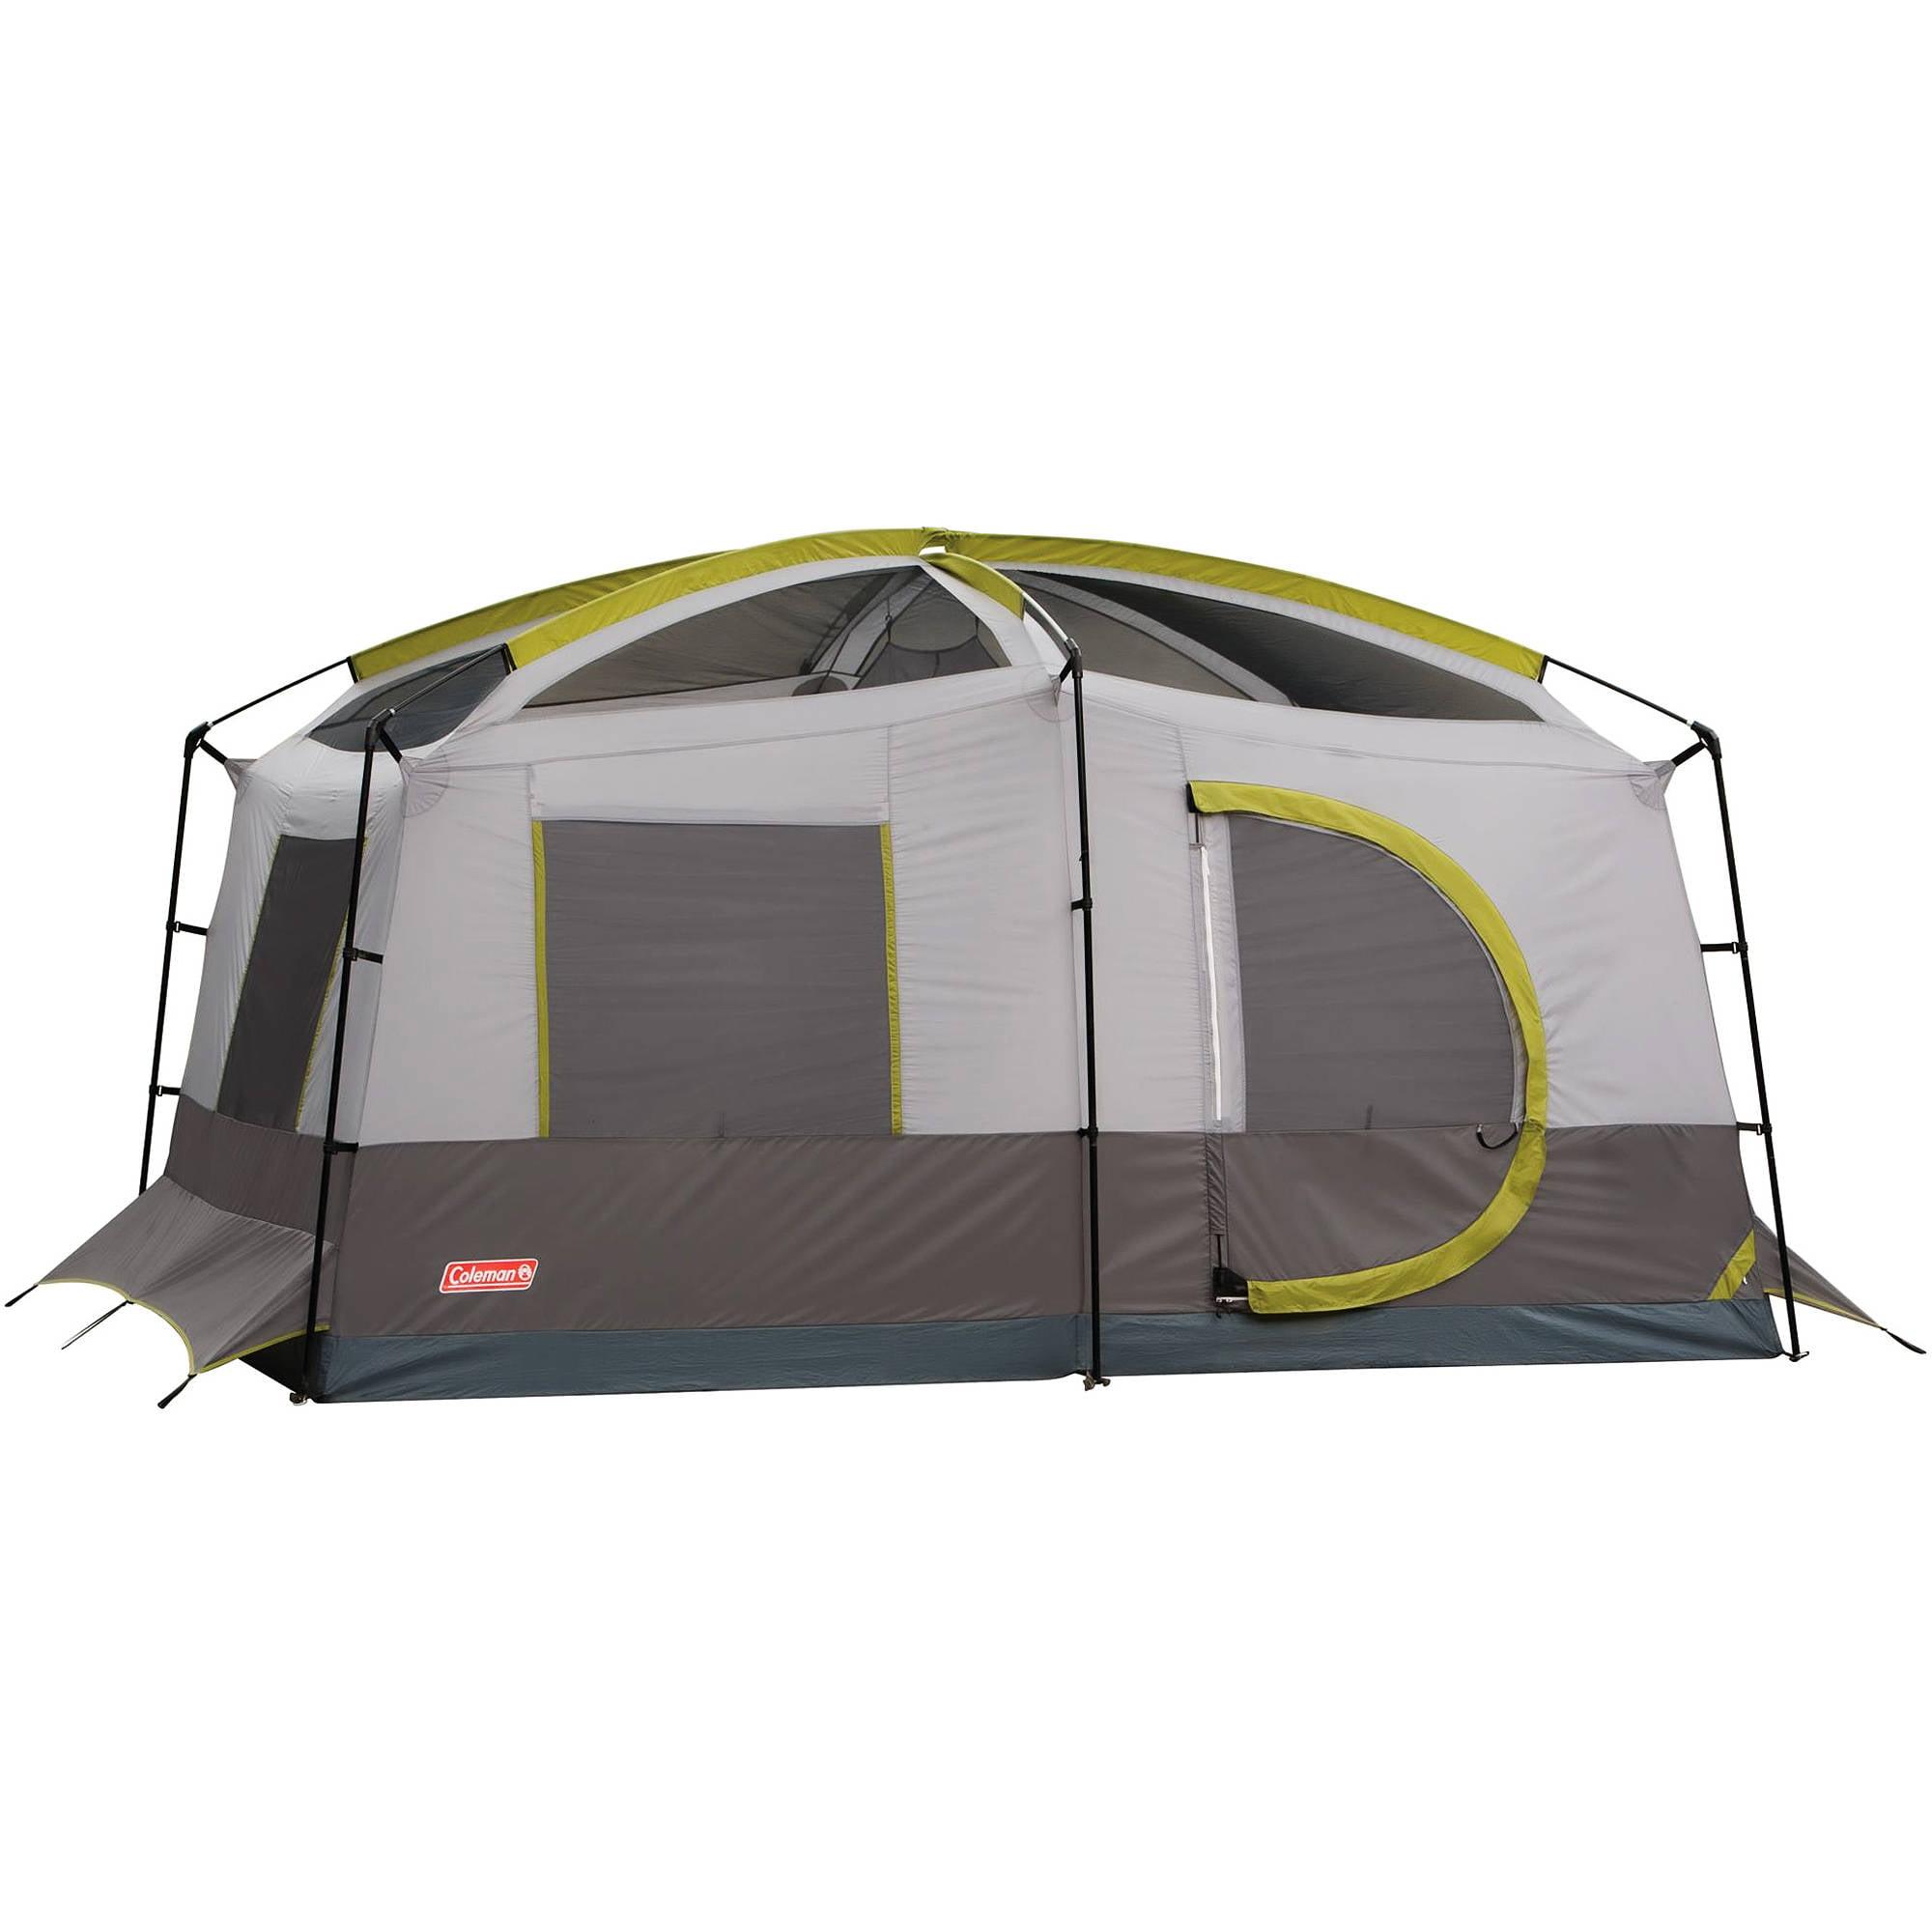 sc 1 st  Walmart & Coleman Max 13\u0027 x 9\u0027 Family Cabin Tent - Walmart.com